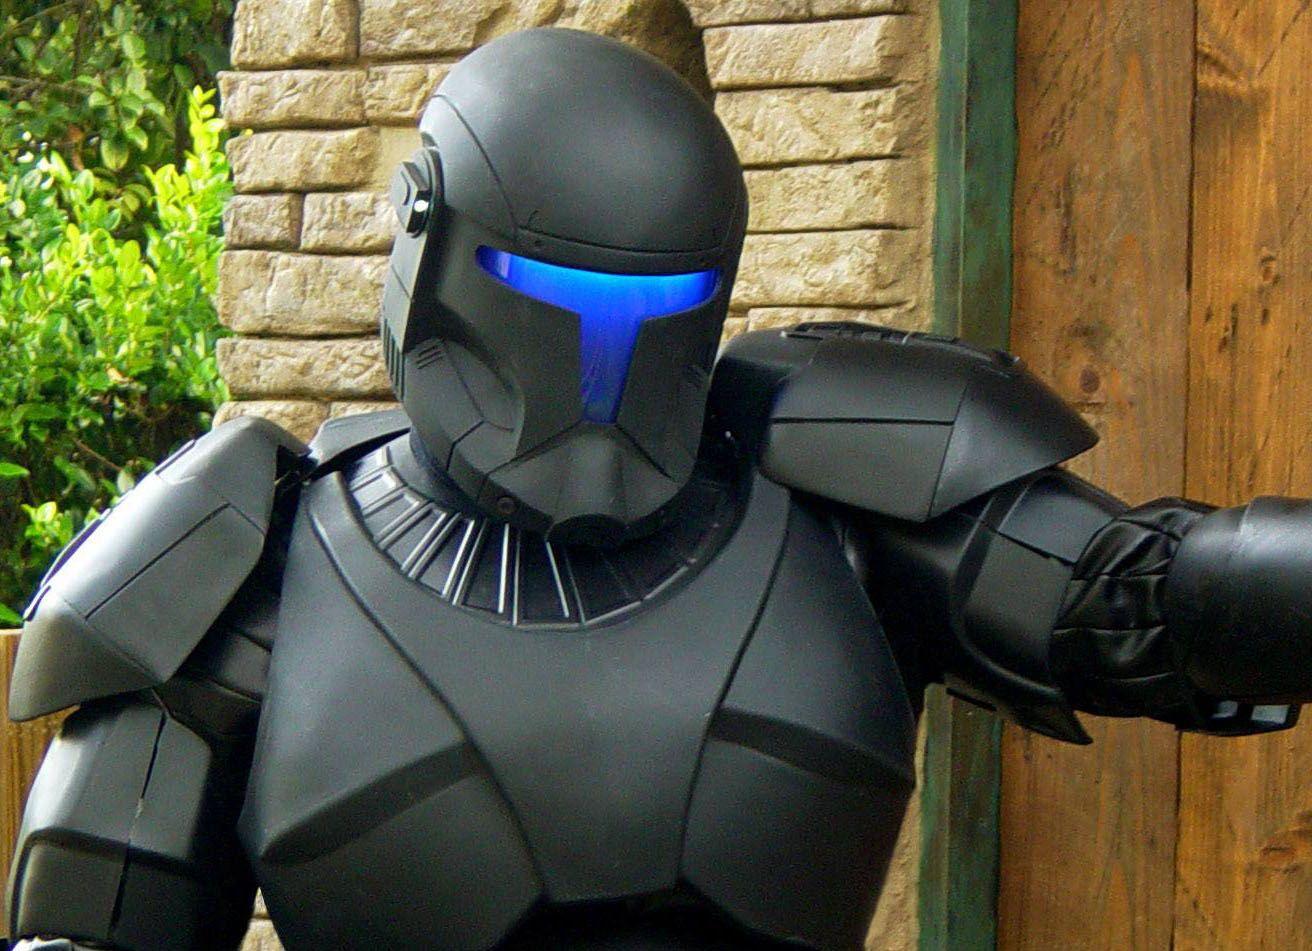 Republic Commando Helmet Armor Costume For Cosplay Cosplay